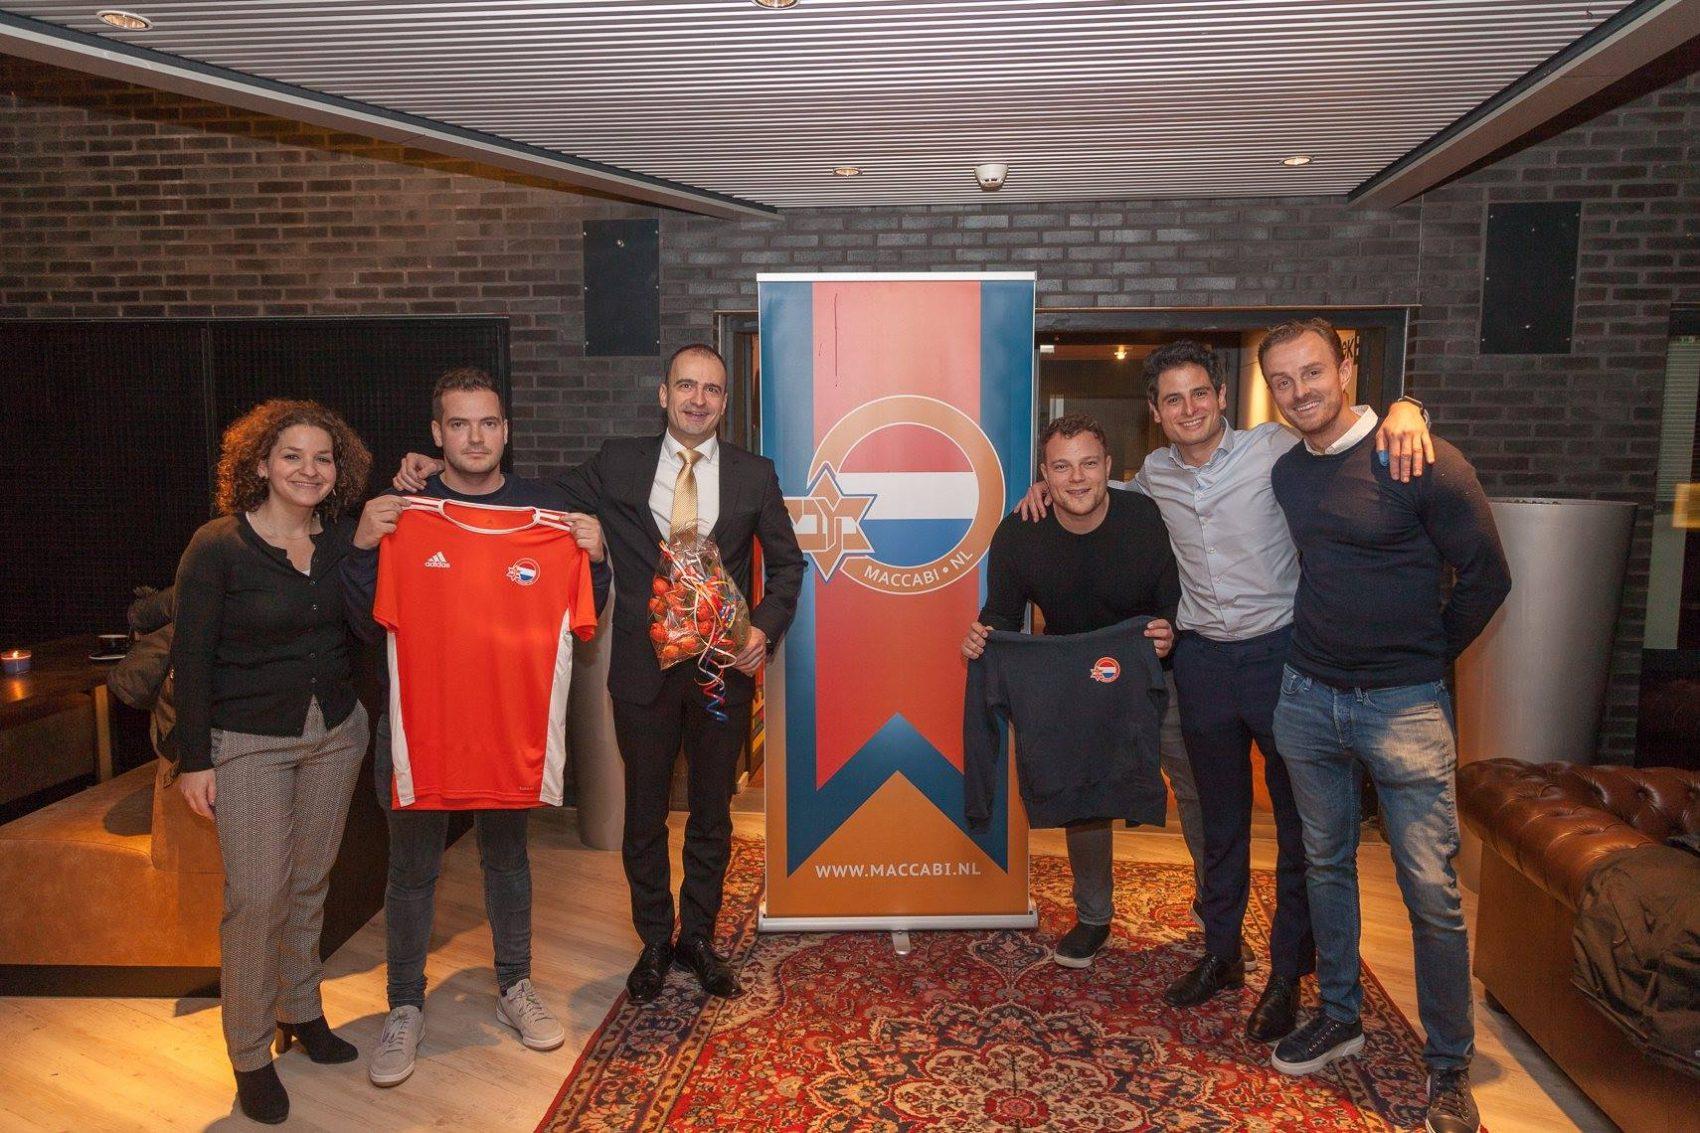 Foto Maccabi Nederland met de Hongaarse ambassadeur in Nederland dhr. Andras Kocsis 